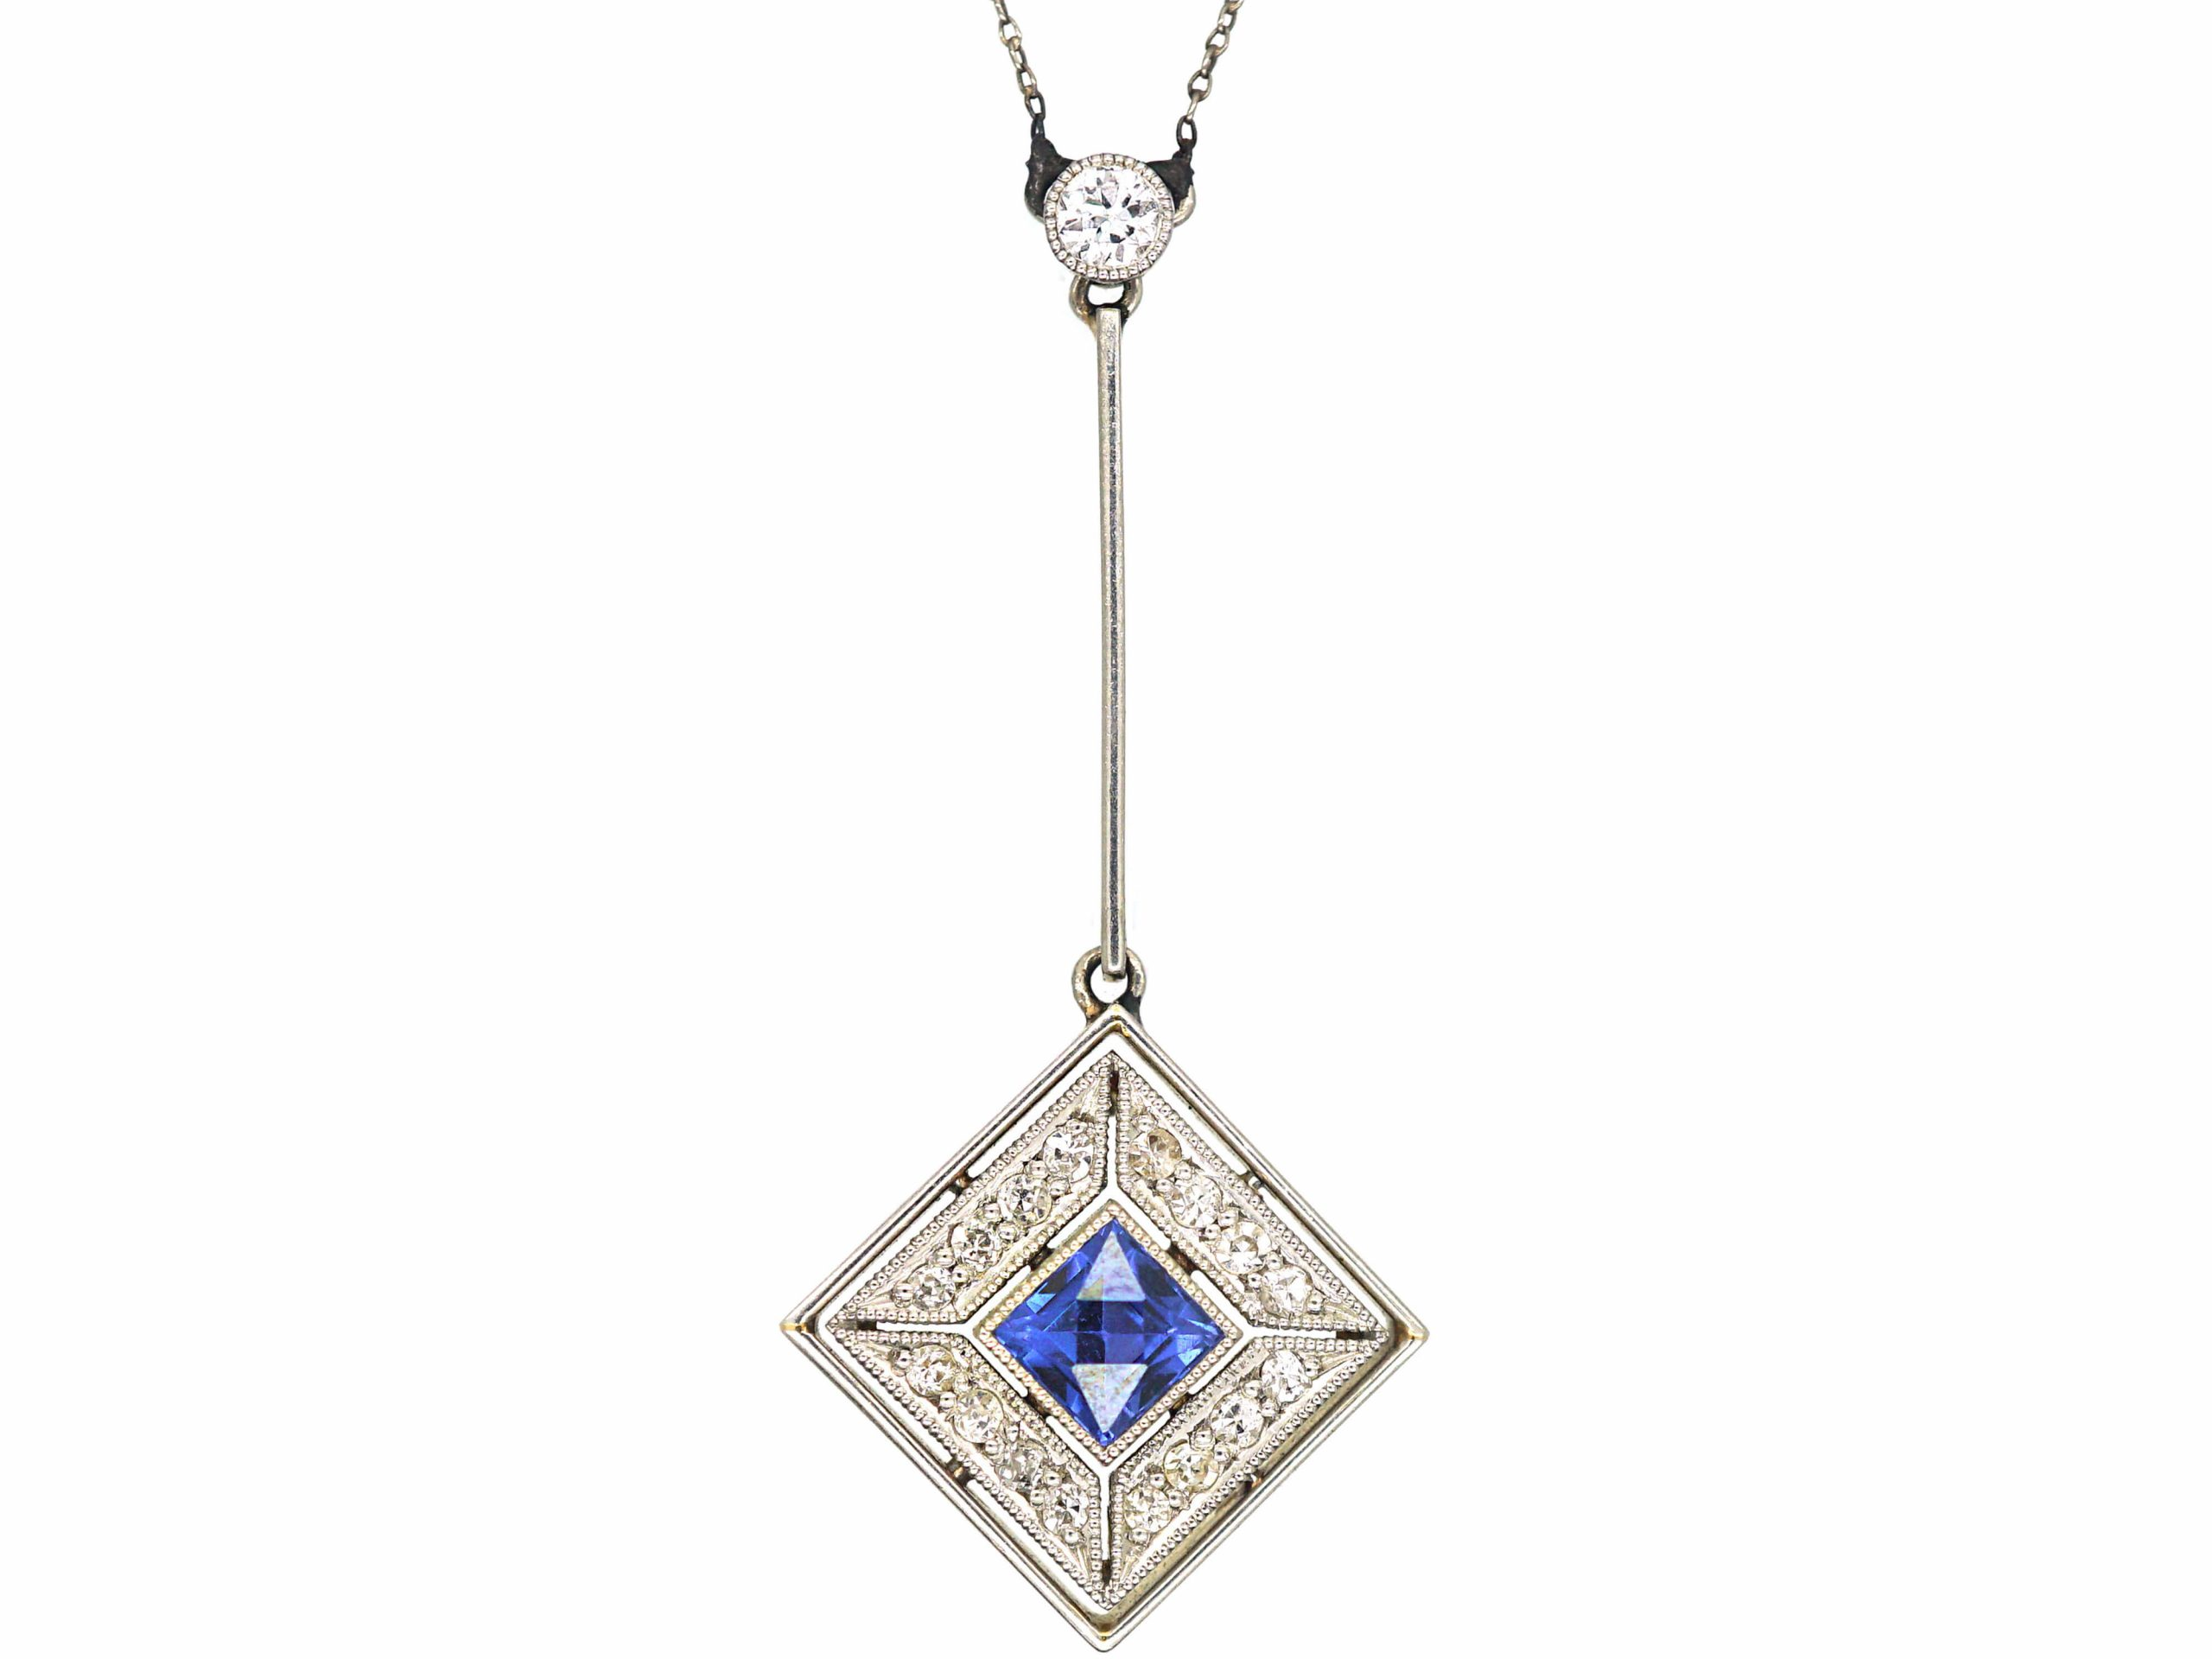 Art Deco 18ct Gold & Platinum, Sapphire & Diamond Pendant on Chain